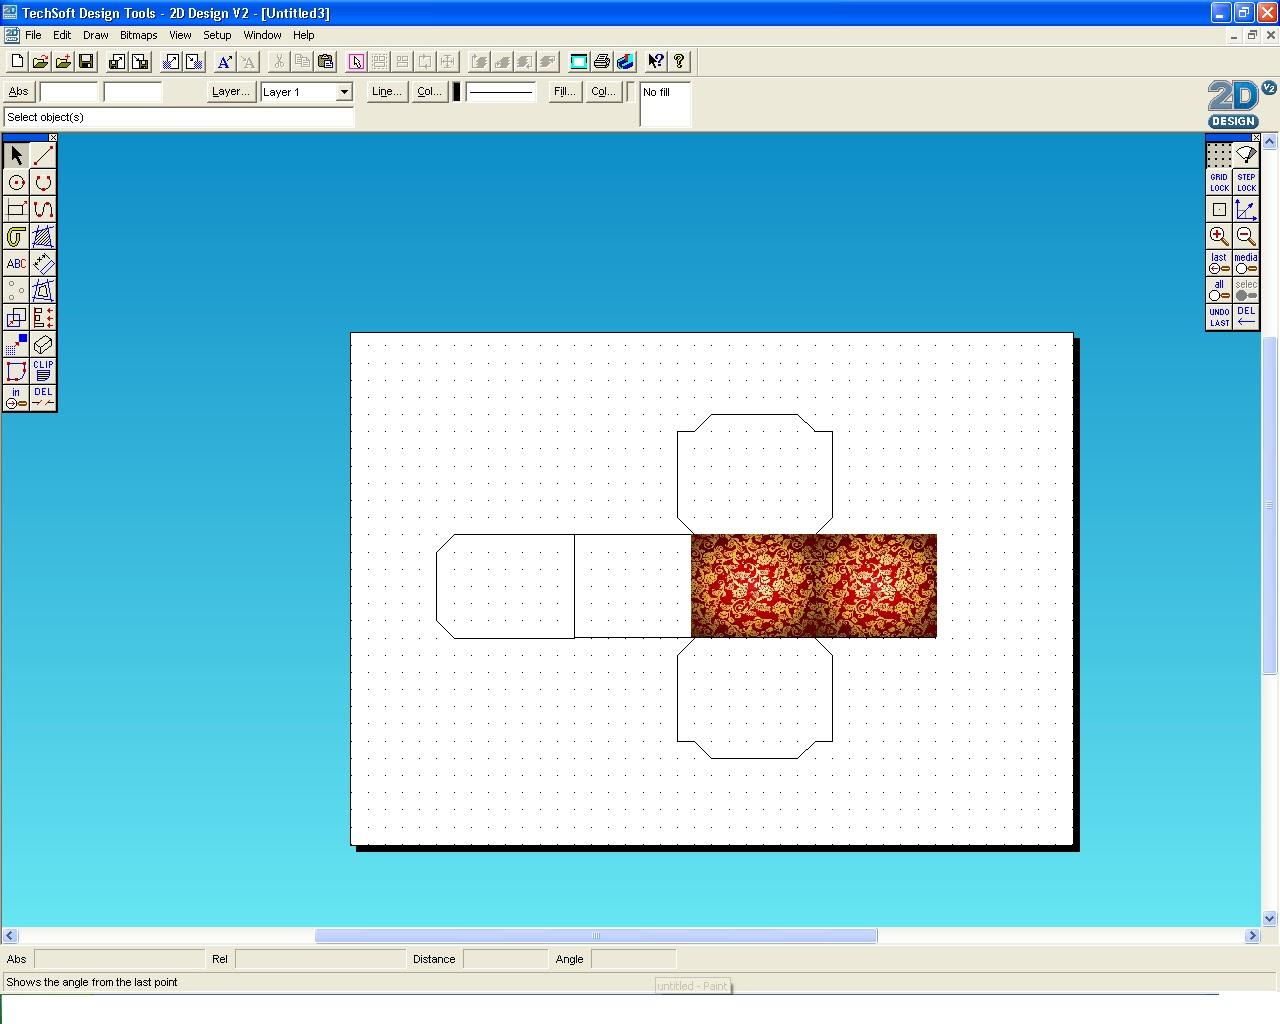 Module Task 2: 2D Design